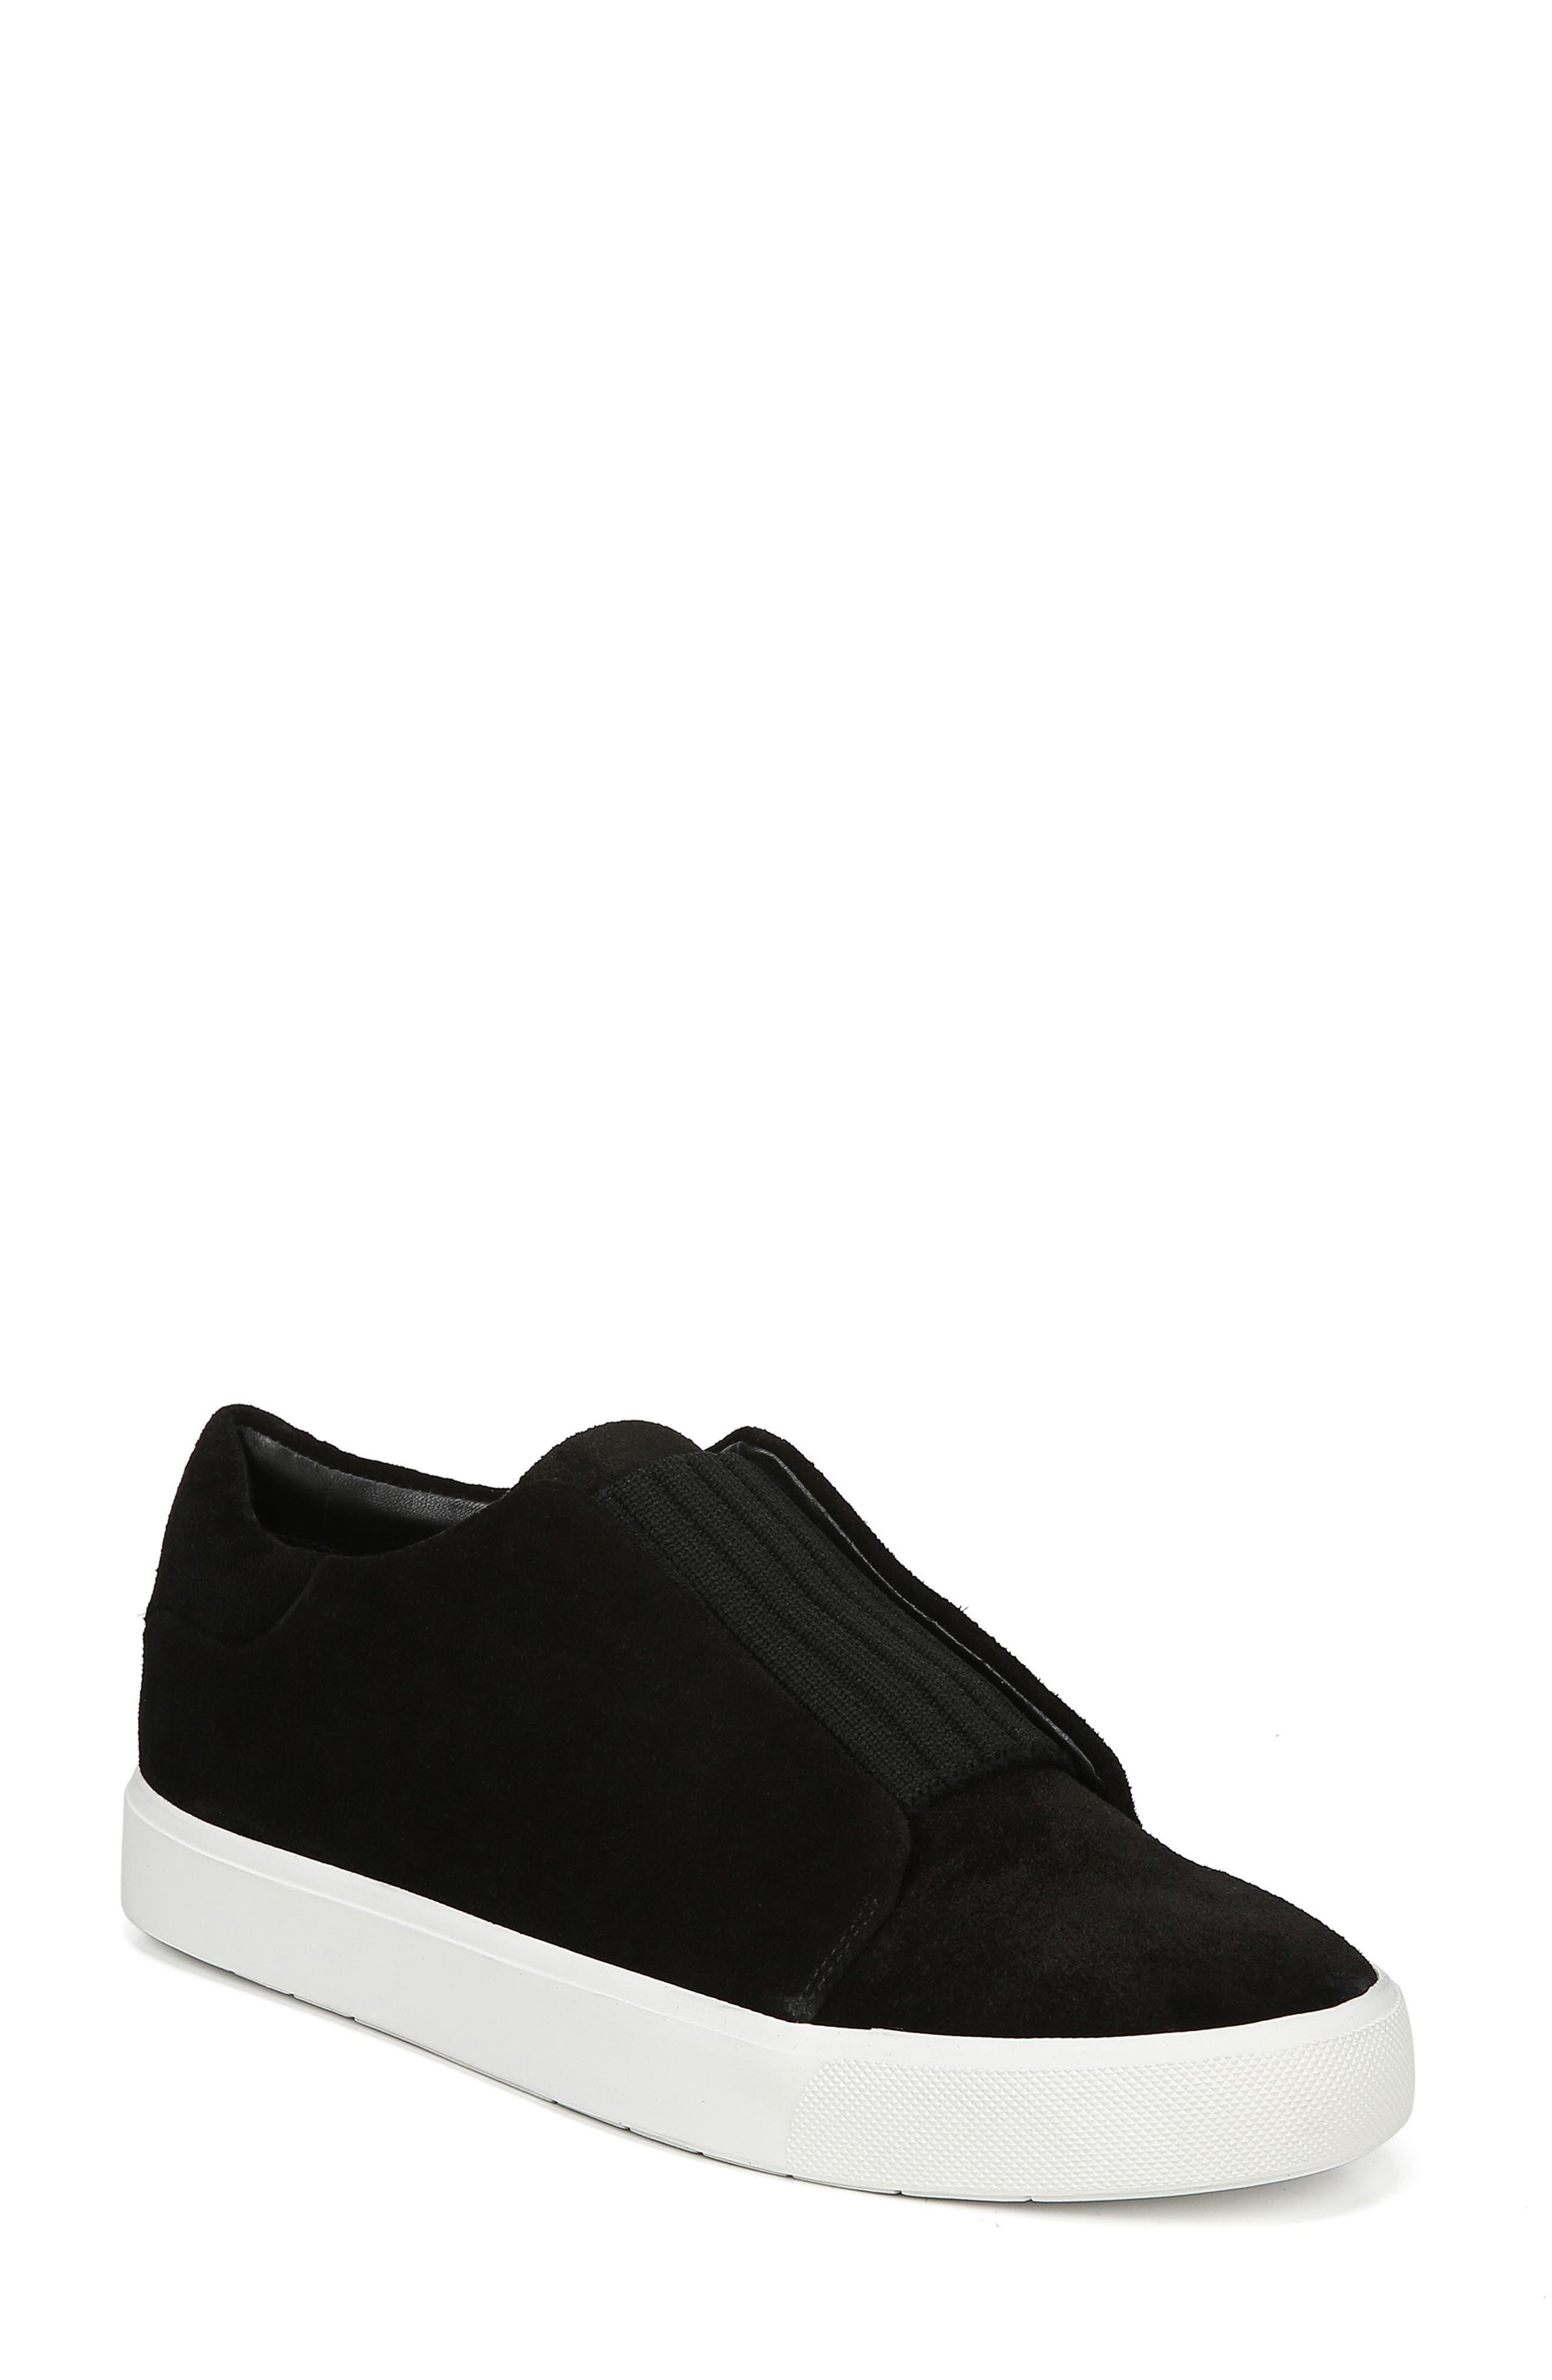 Cantara Slip-On Sneaker,                         Main,                         color, BLACK SUEDE